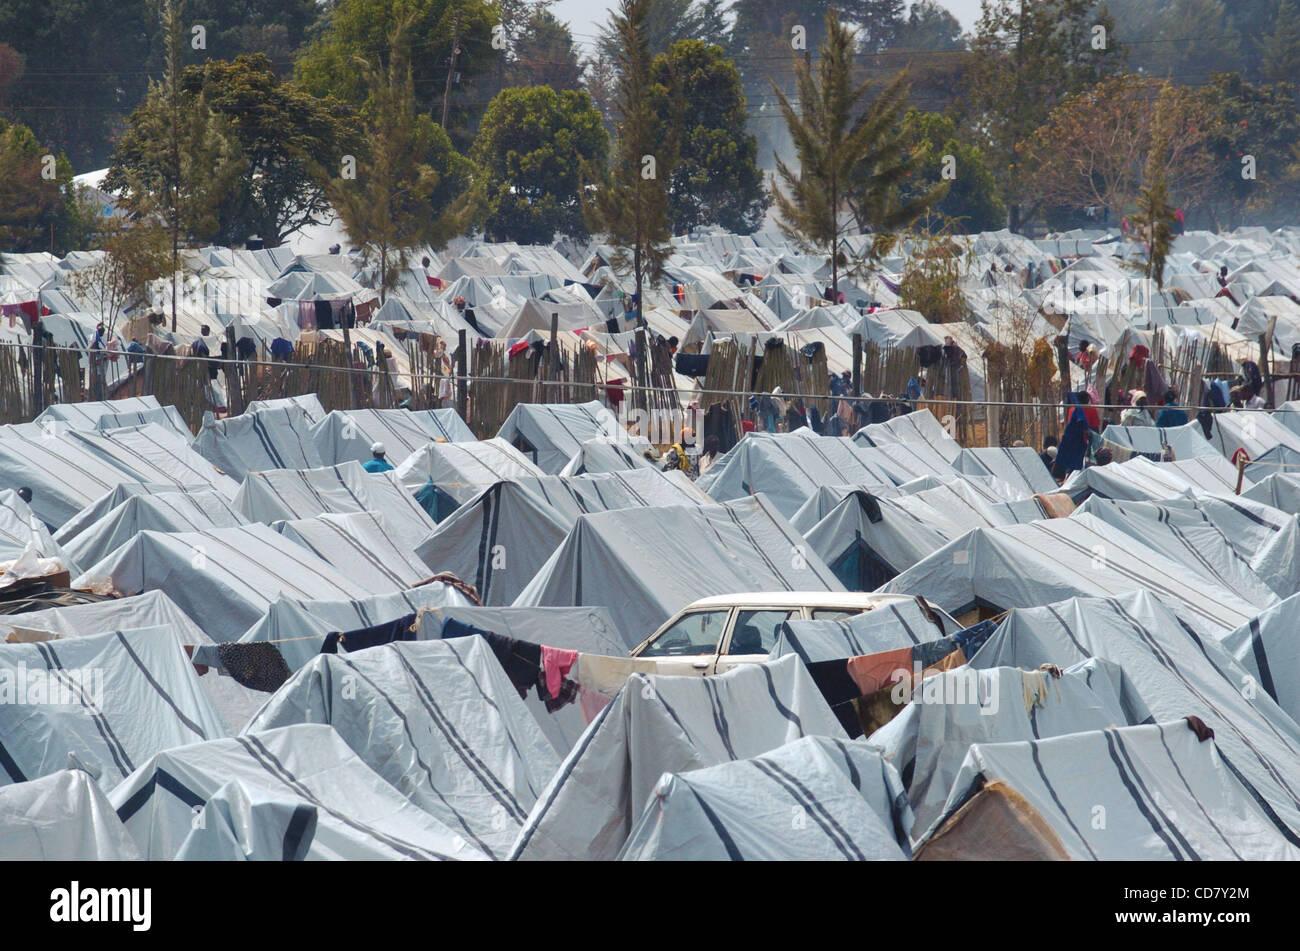 Mar 07, 2008 - Eldoret, Kenya - Kenya has been convulsed by ethnic bloodshed since President Mwai Kibaki's disputed Stock Photo